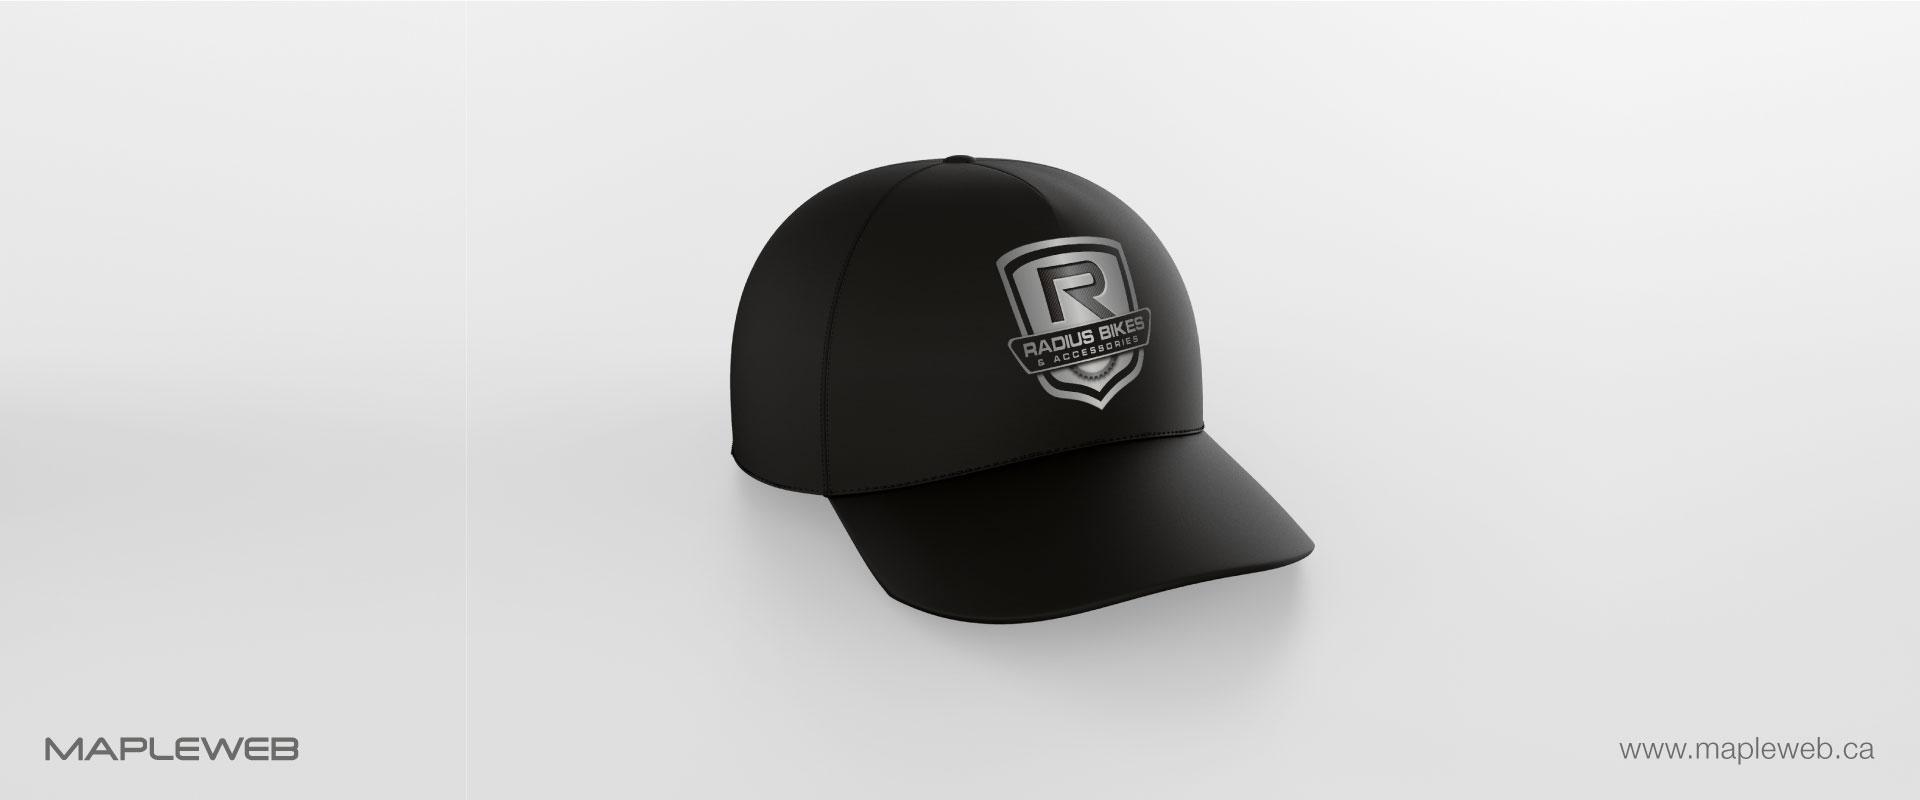 radius-bikes-brand-logo-design-by-mapleweb-vancouver-canada-cap-mock